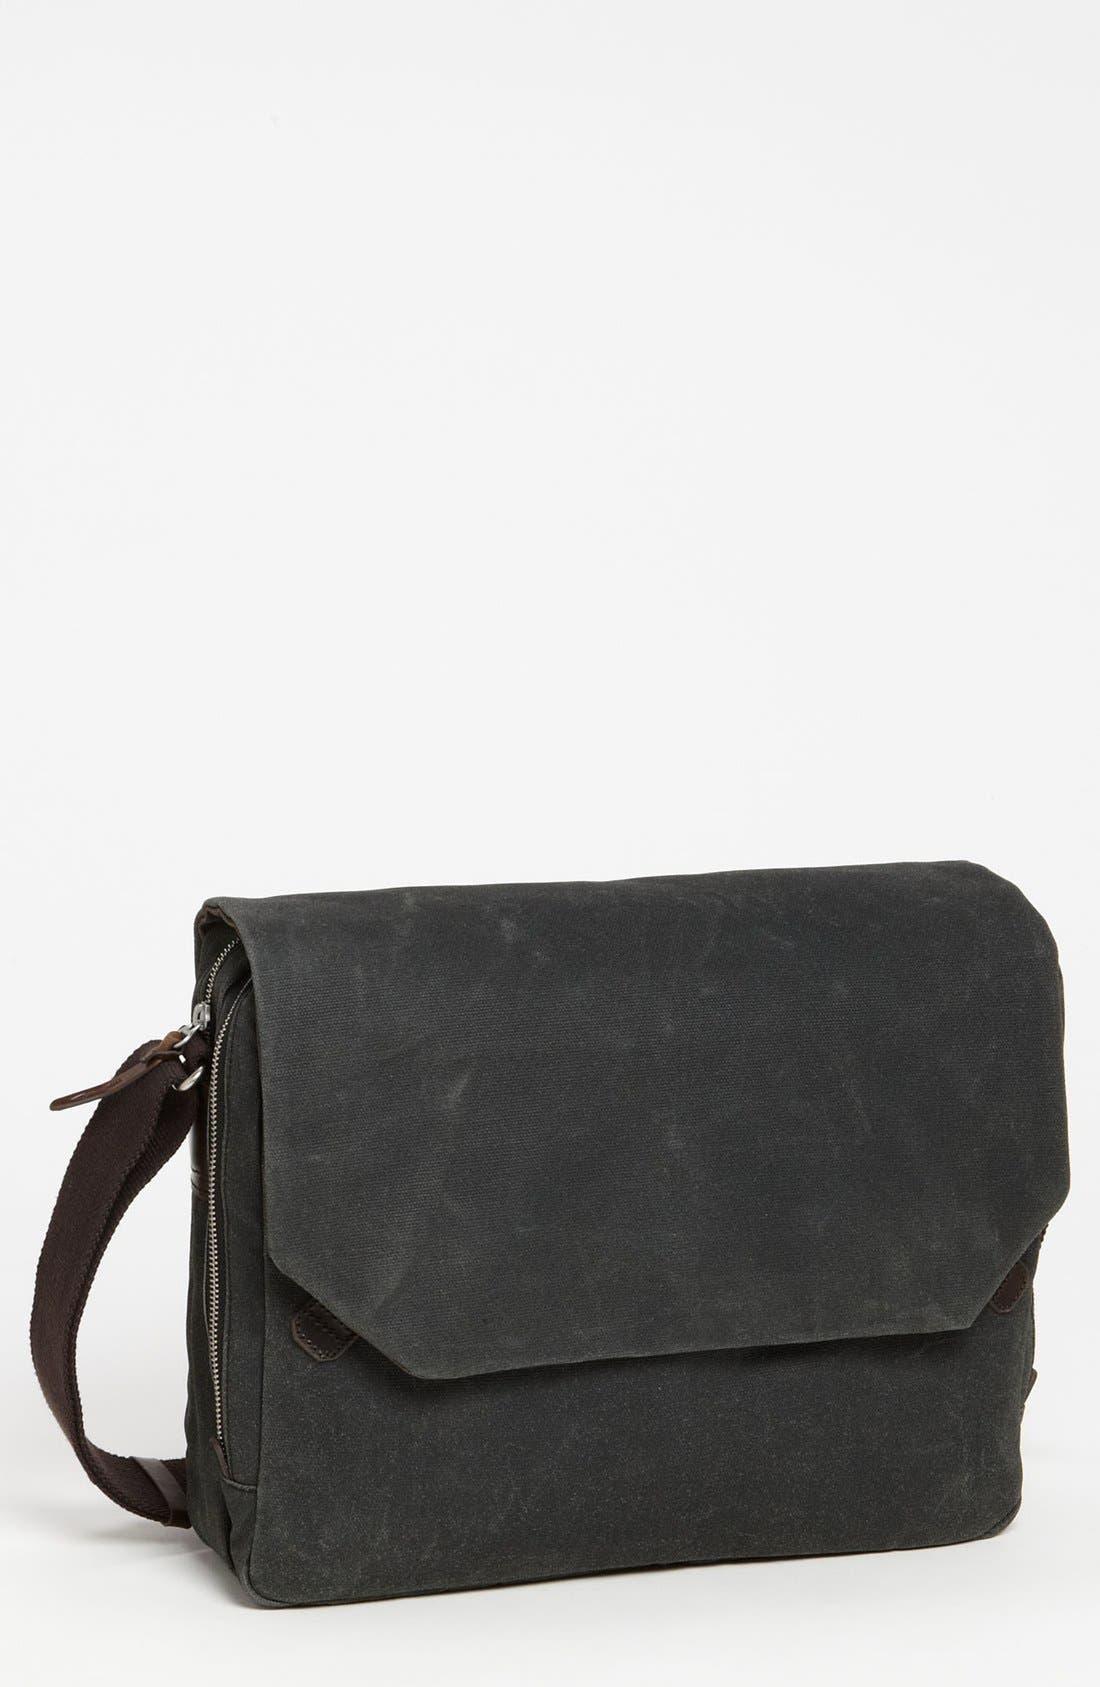 Alternate Image 1 Selected - Property Of… 'Wally' Messenger Bag